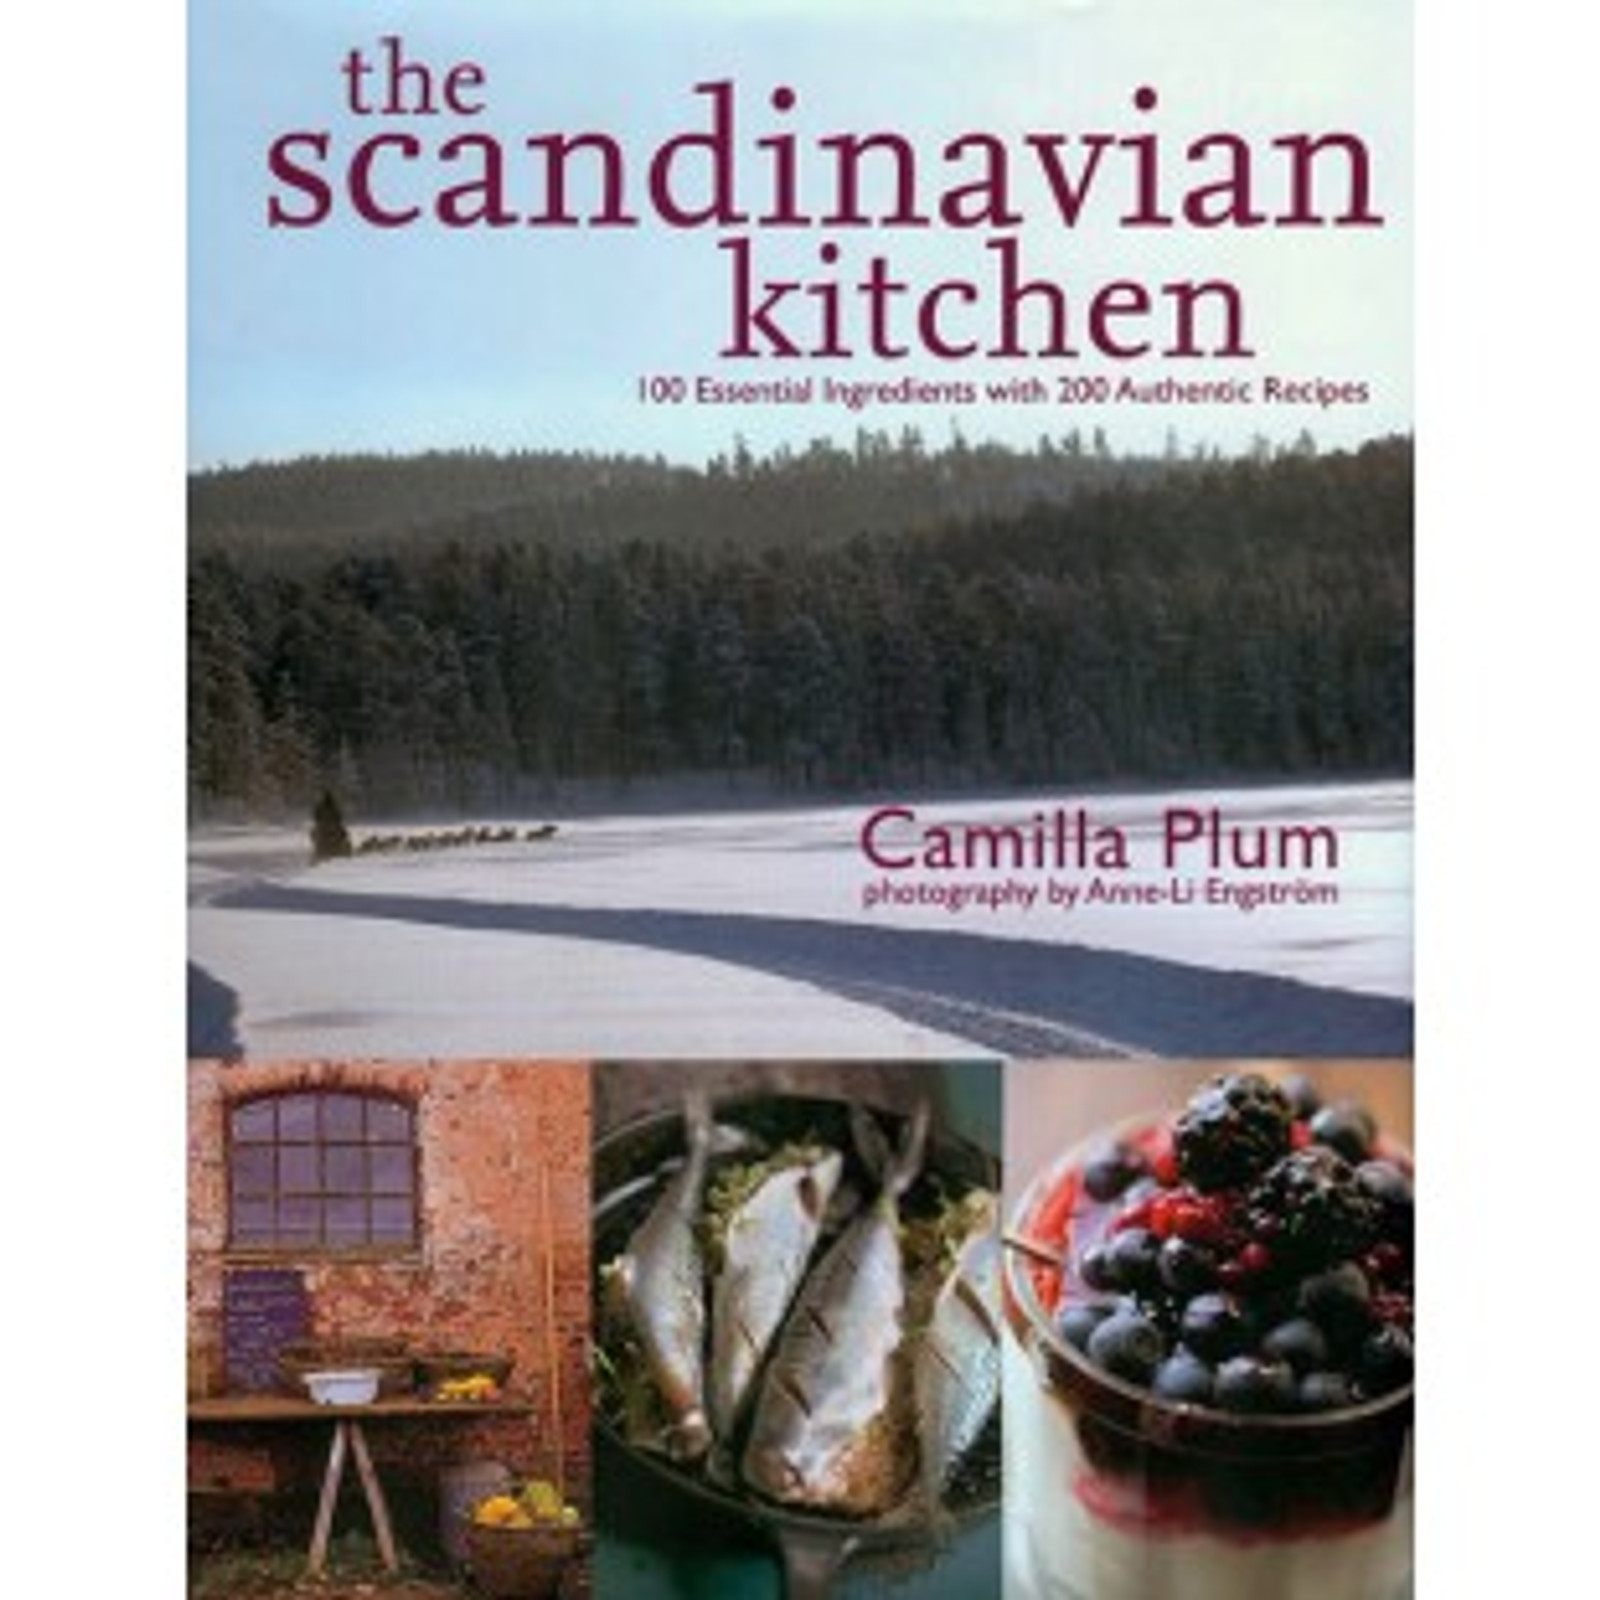 The Scandinavian Kitchen, Camilla Plum